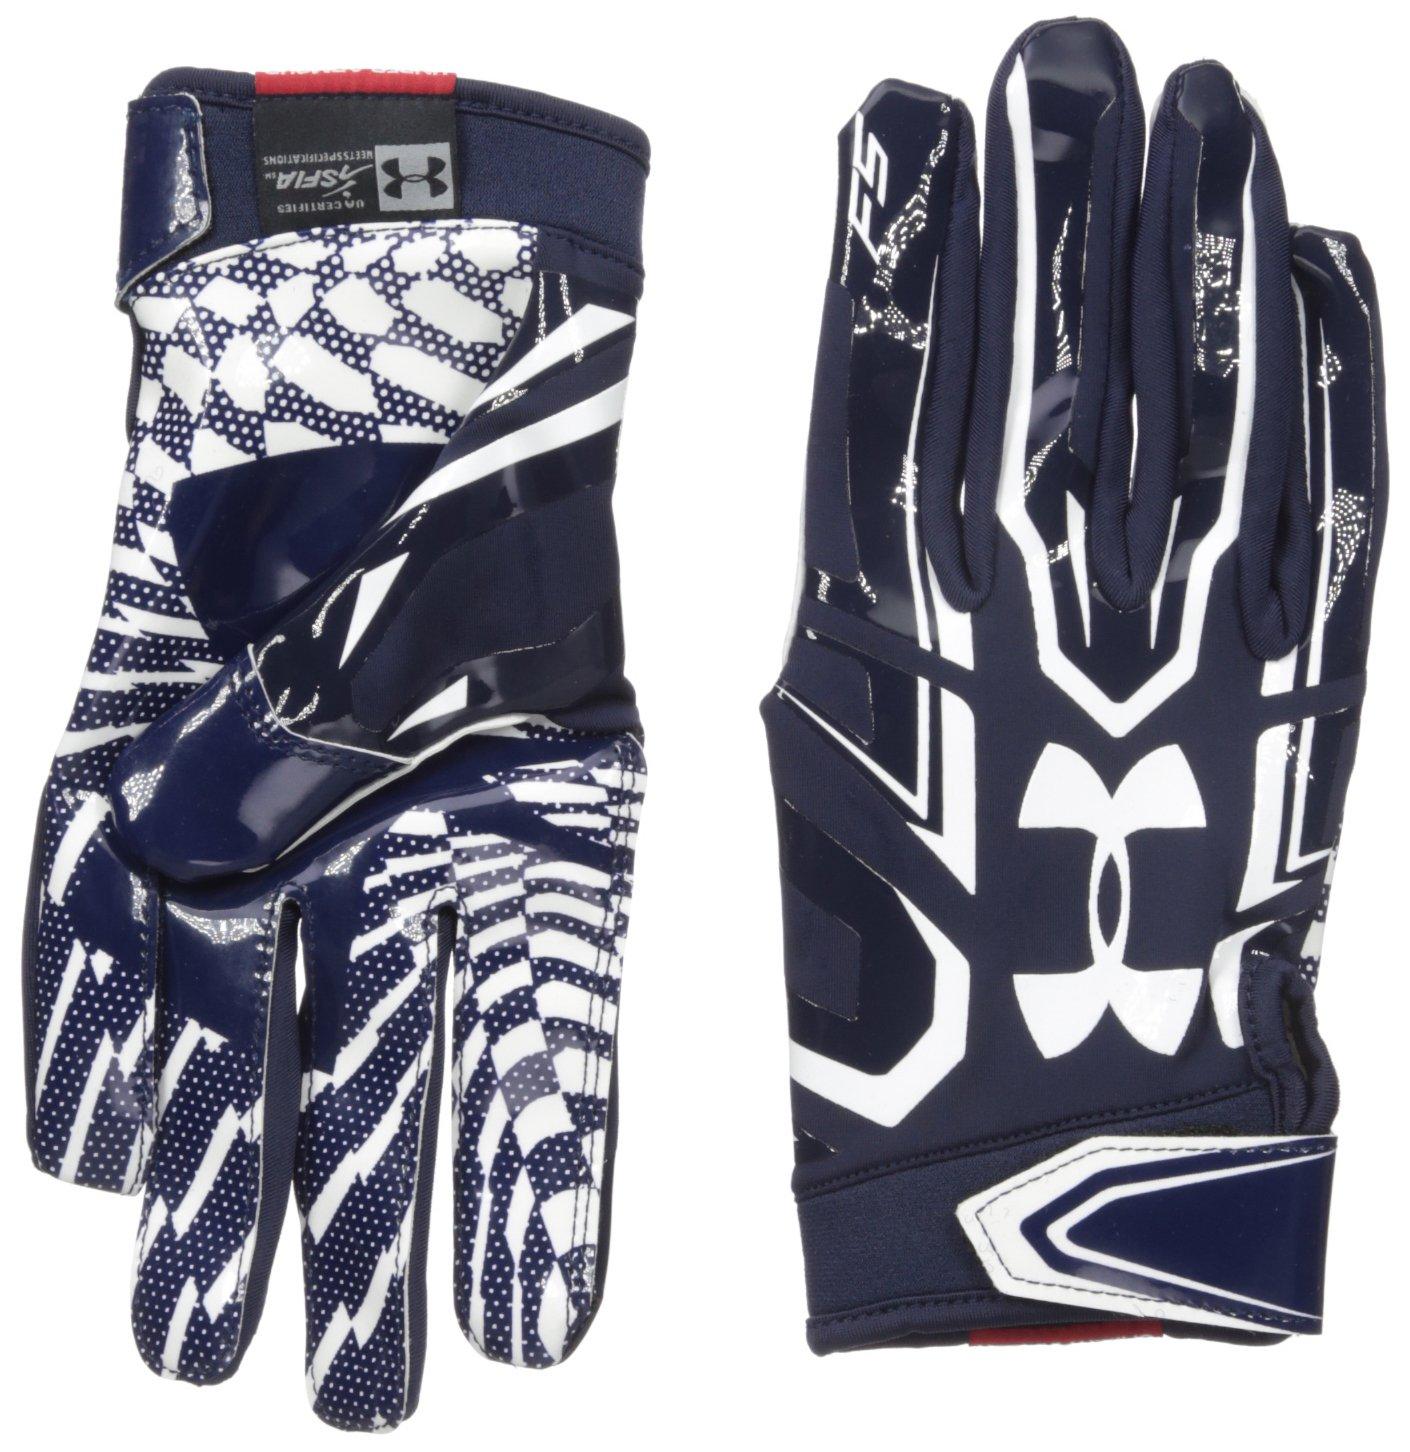 Under Armourメンズf5 Football Gloves B01A6LYO0Y ネイビー/ホワイト(Midnight Navy/White) Small Small|ネイビー/ホワイト(Midnight Navy/White)